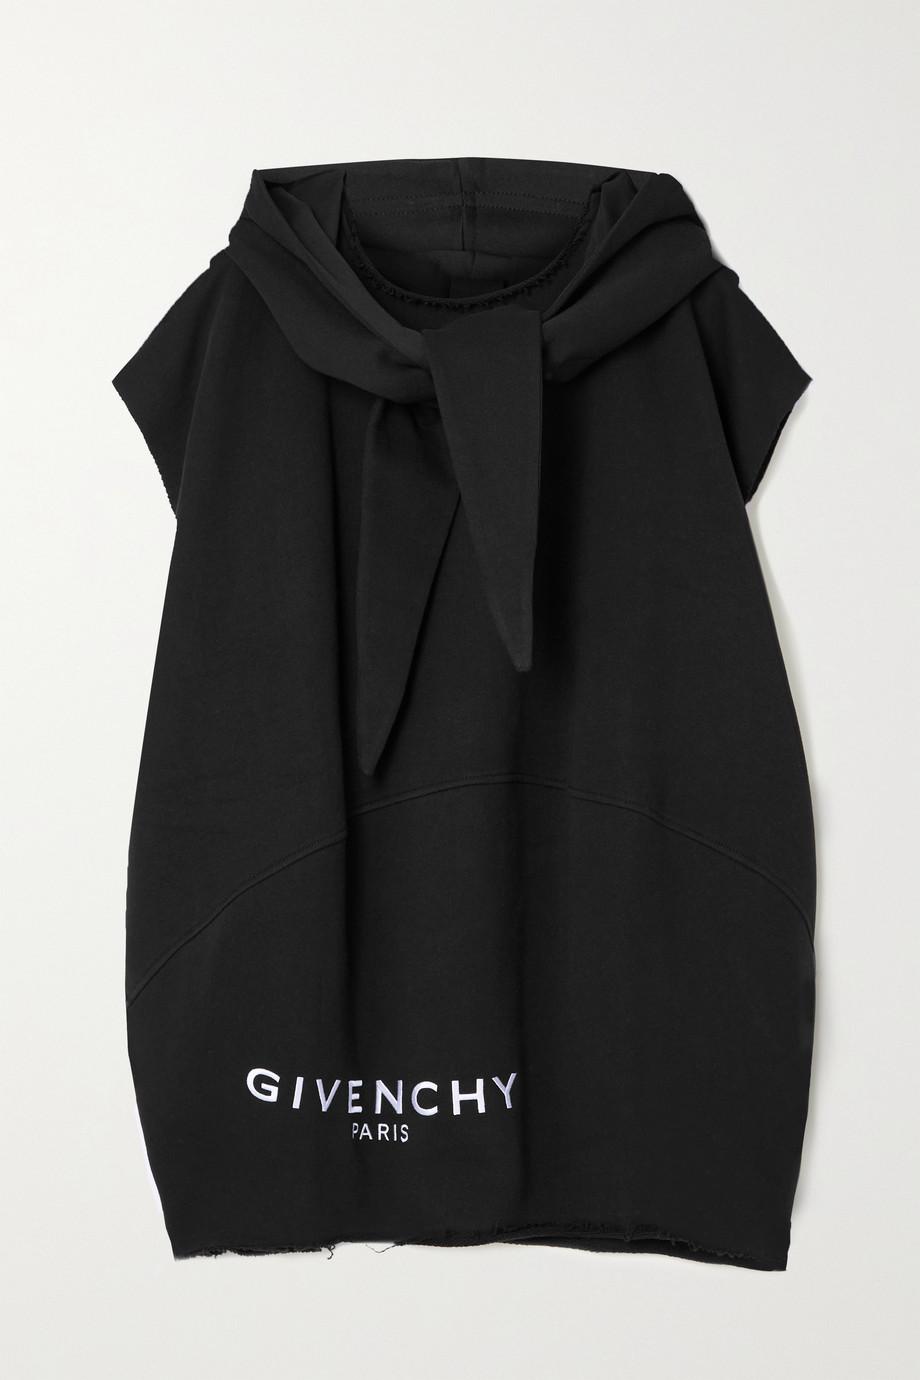 Givenchy 大廓形磨边刺绣纯棉平纹布帽衫